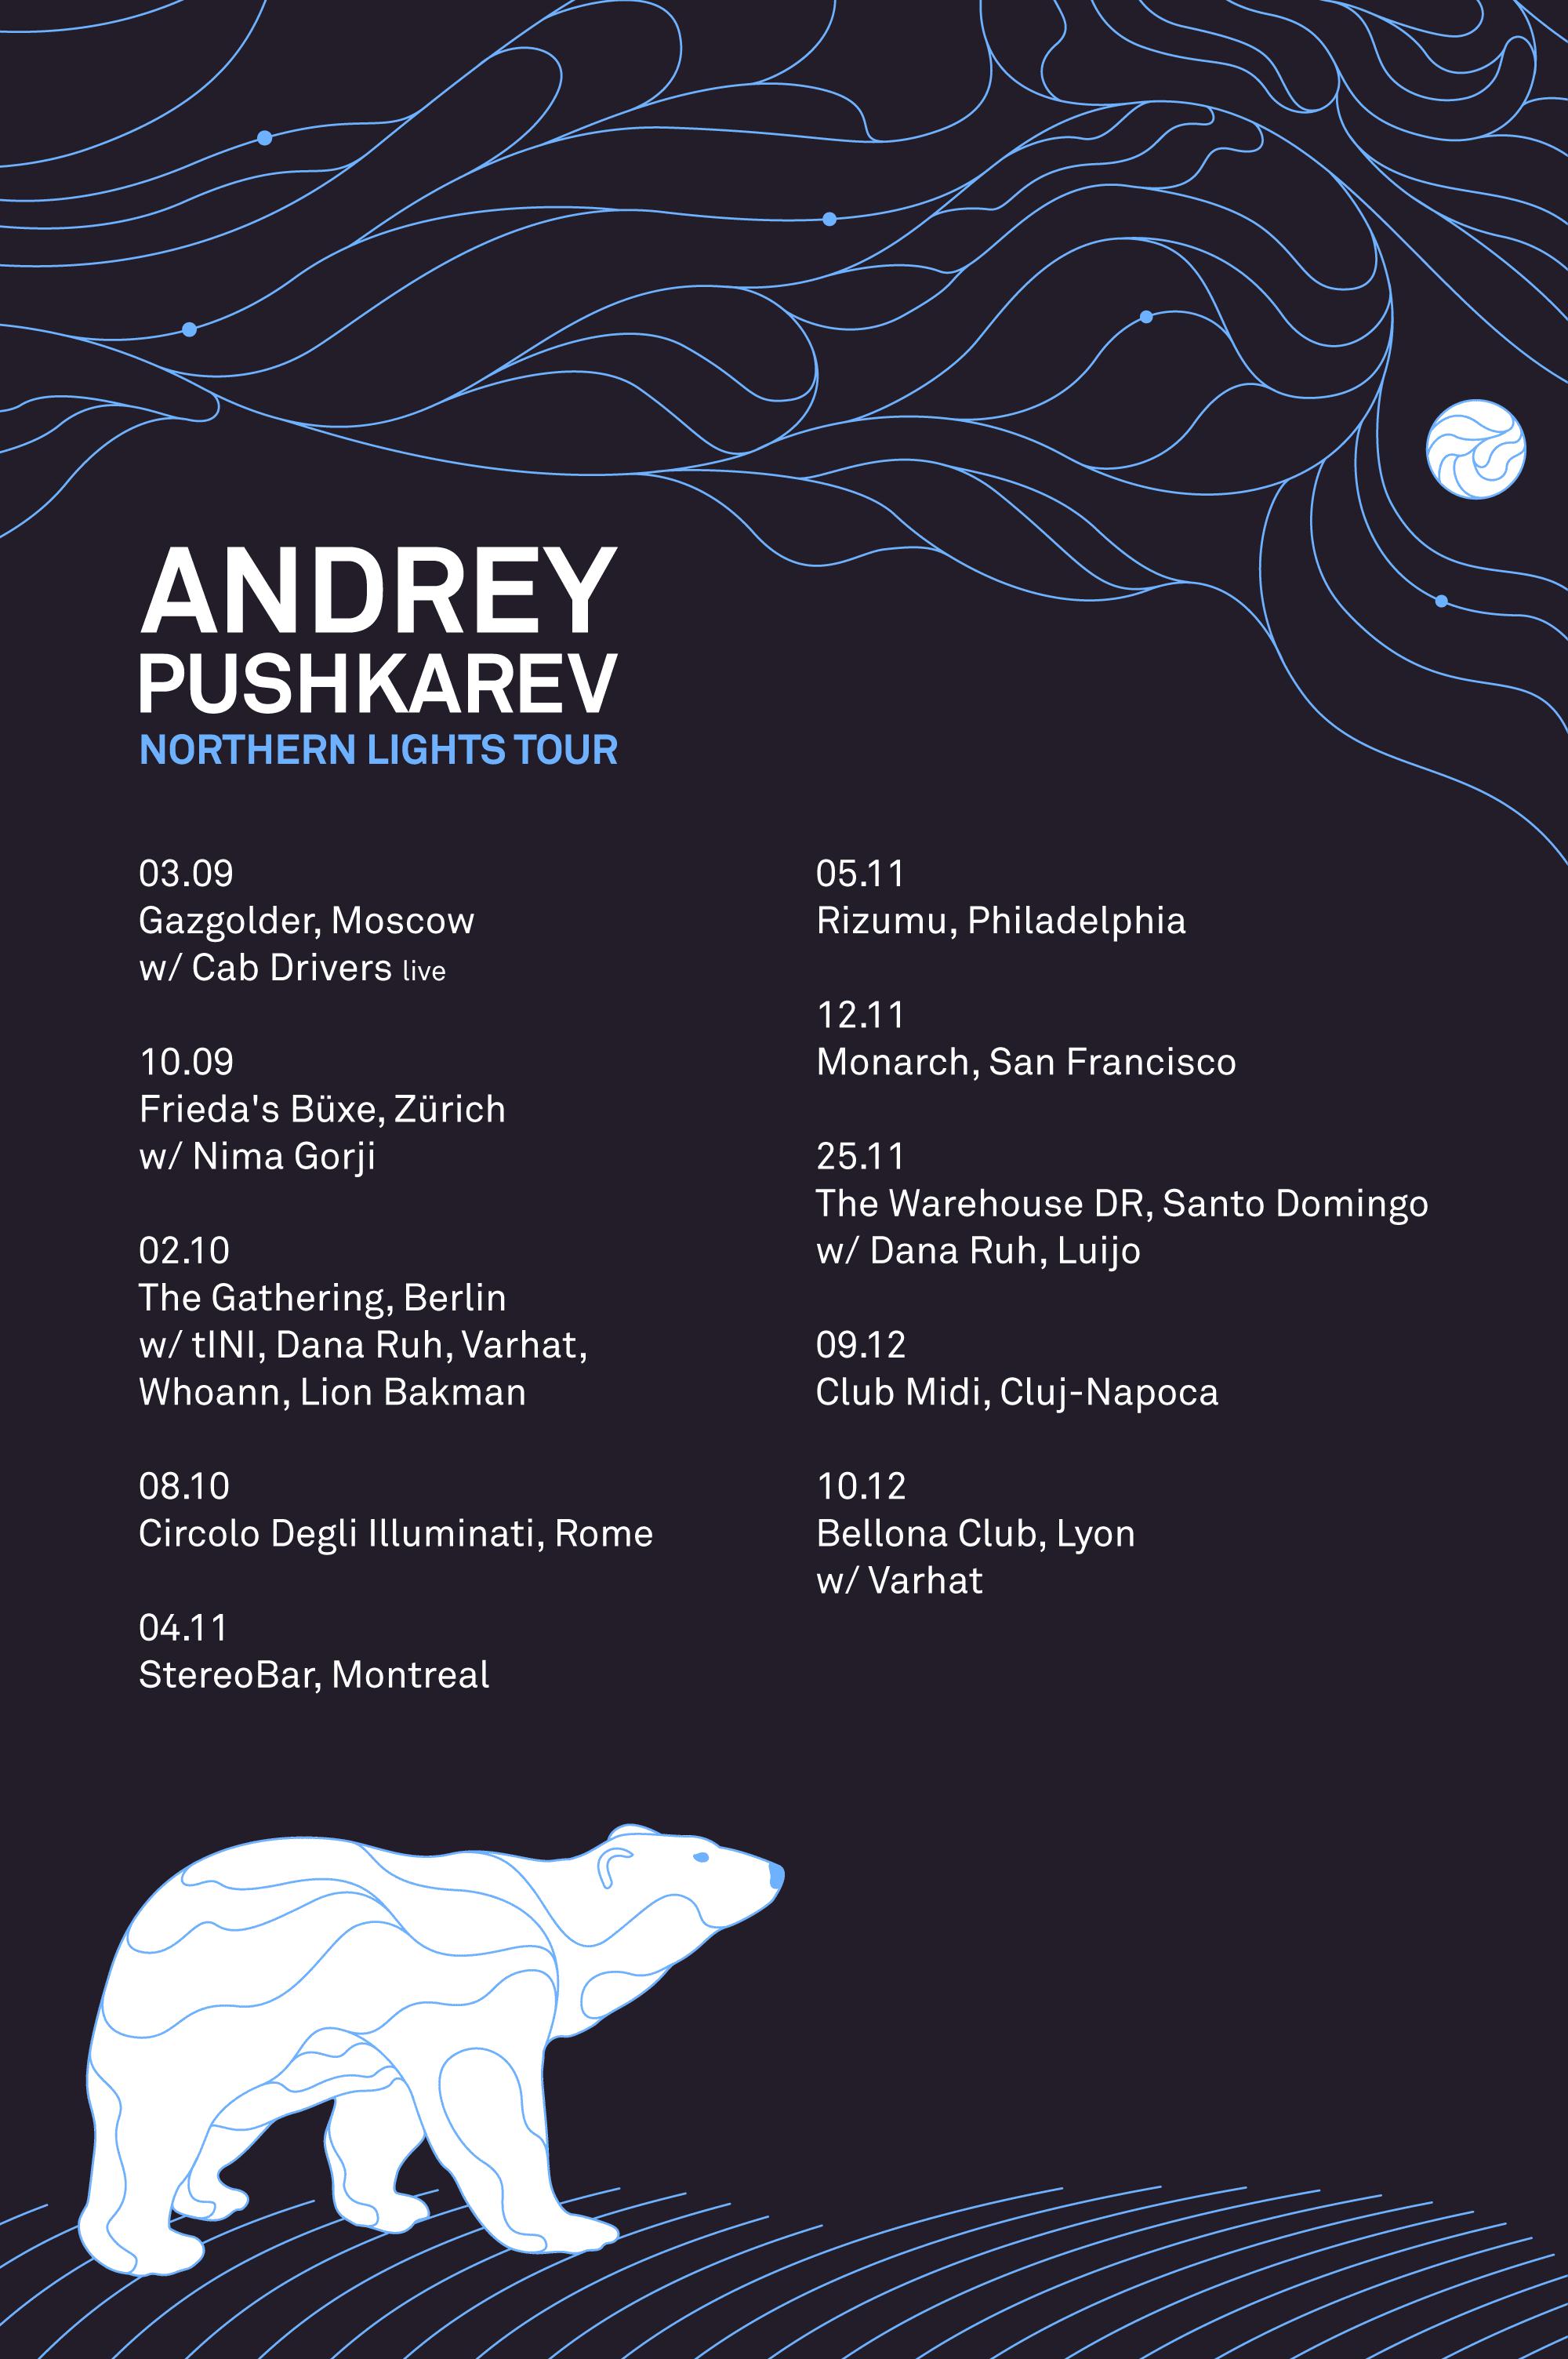 Andrey Pushkarev announces long awaited Debut World Tour